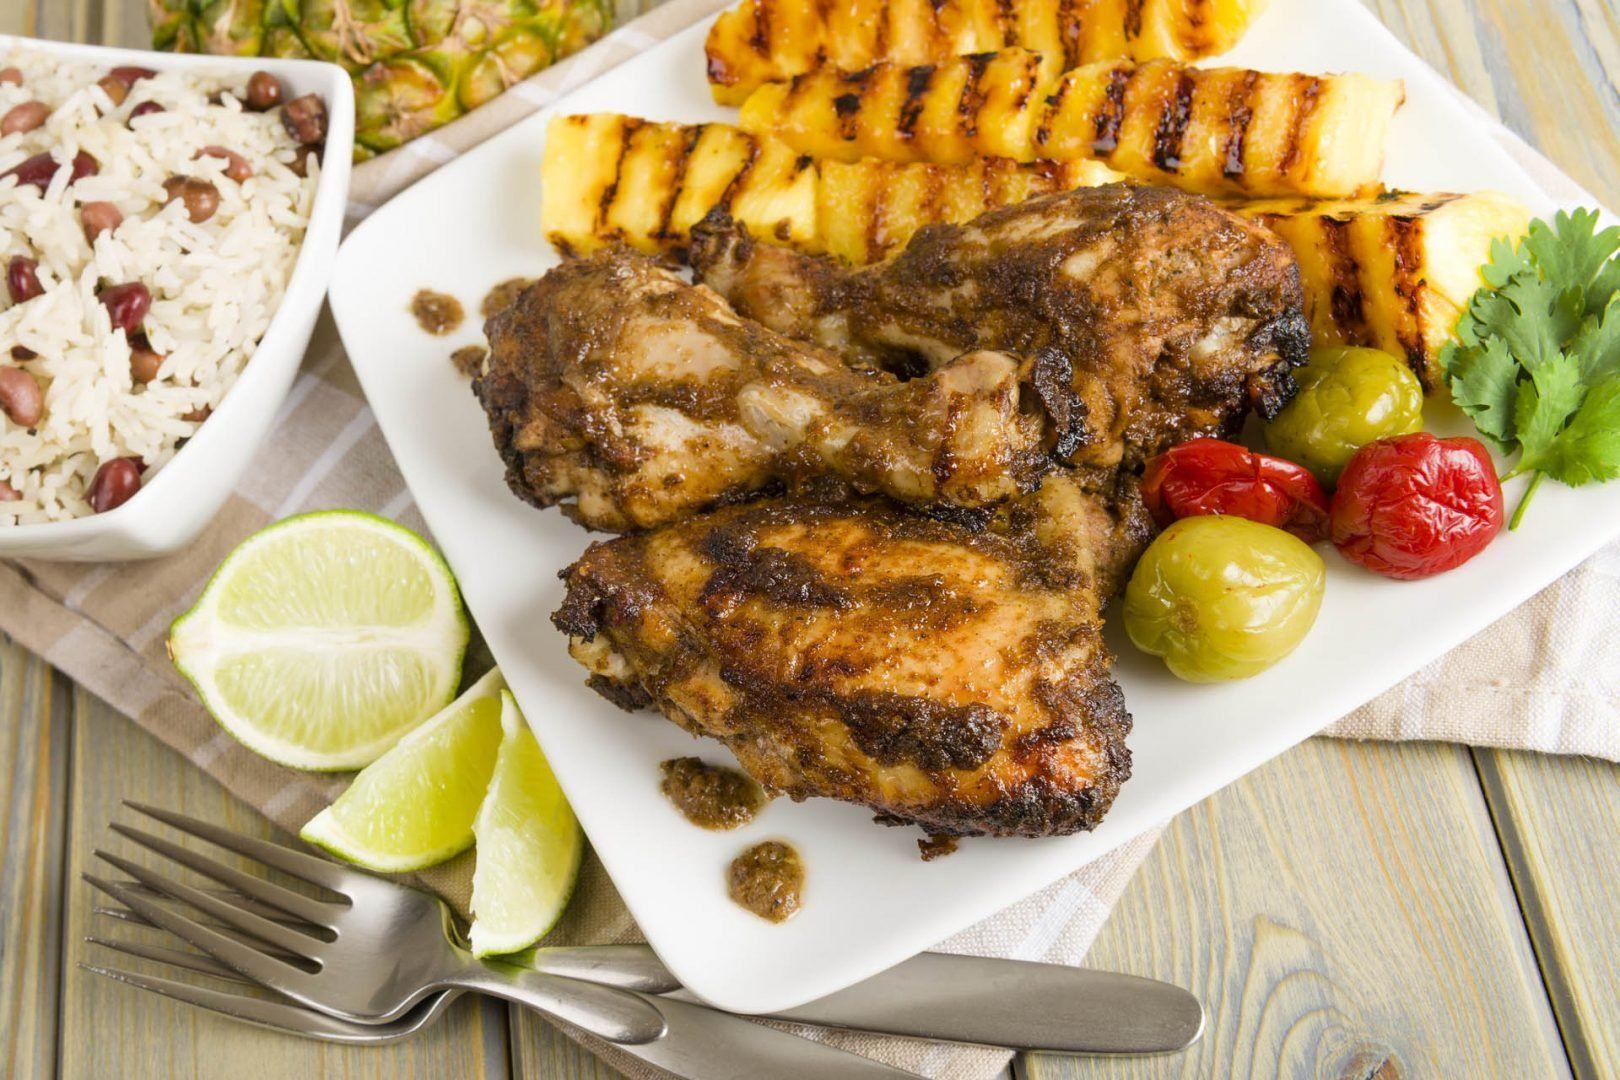 jerk-chicken-jamaica-shutterstock_128910524